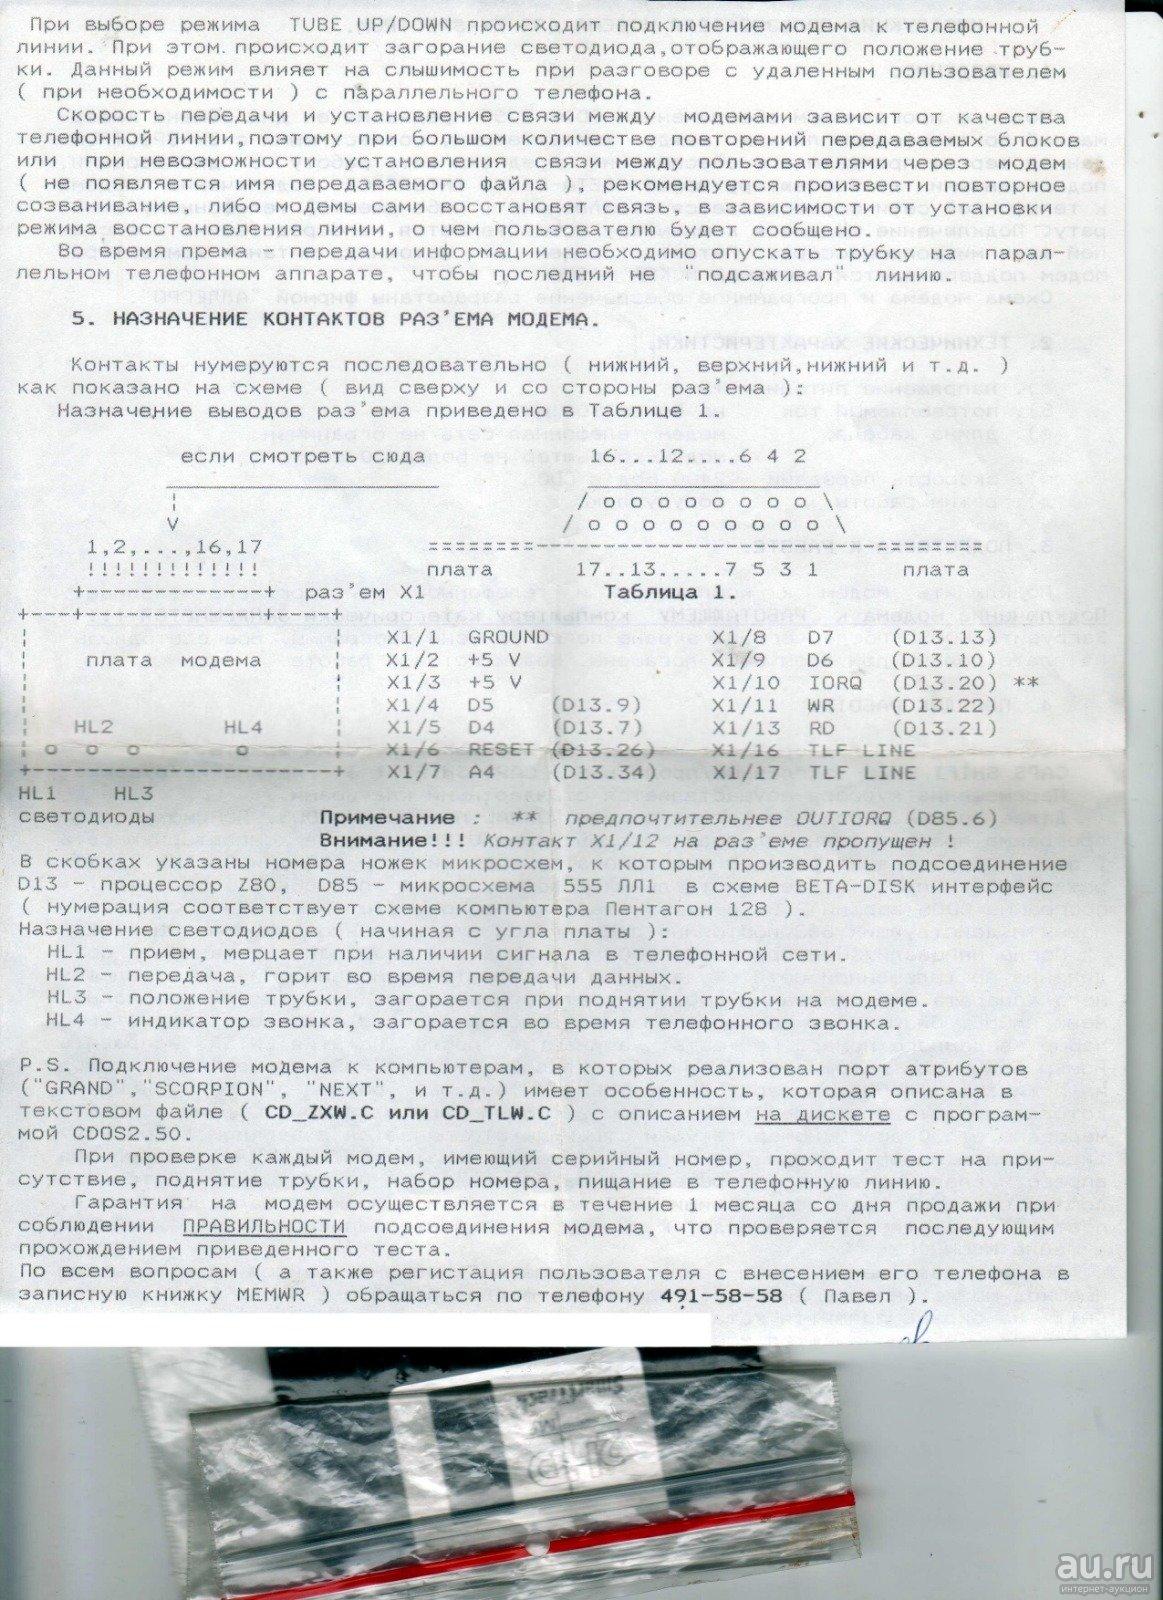 https://zxdemos.ru/uploads/images/2/f721f549ebe4672a49c37a0b1742765e.jpg